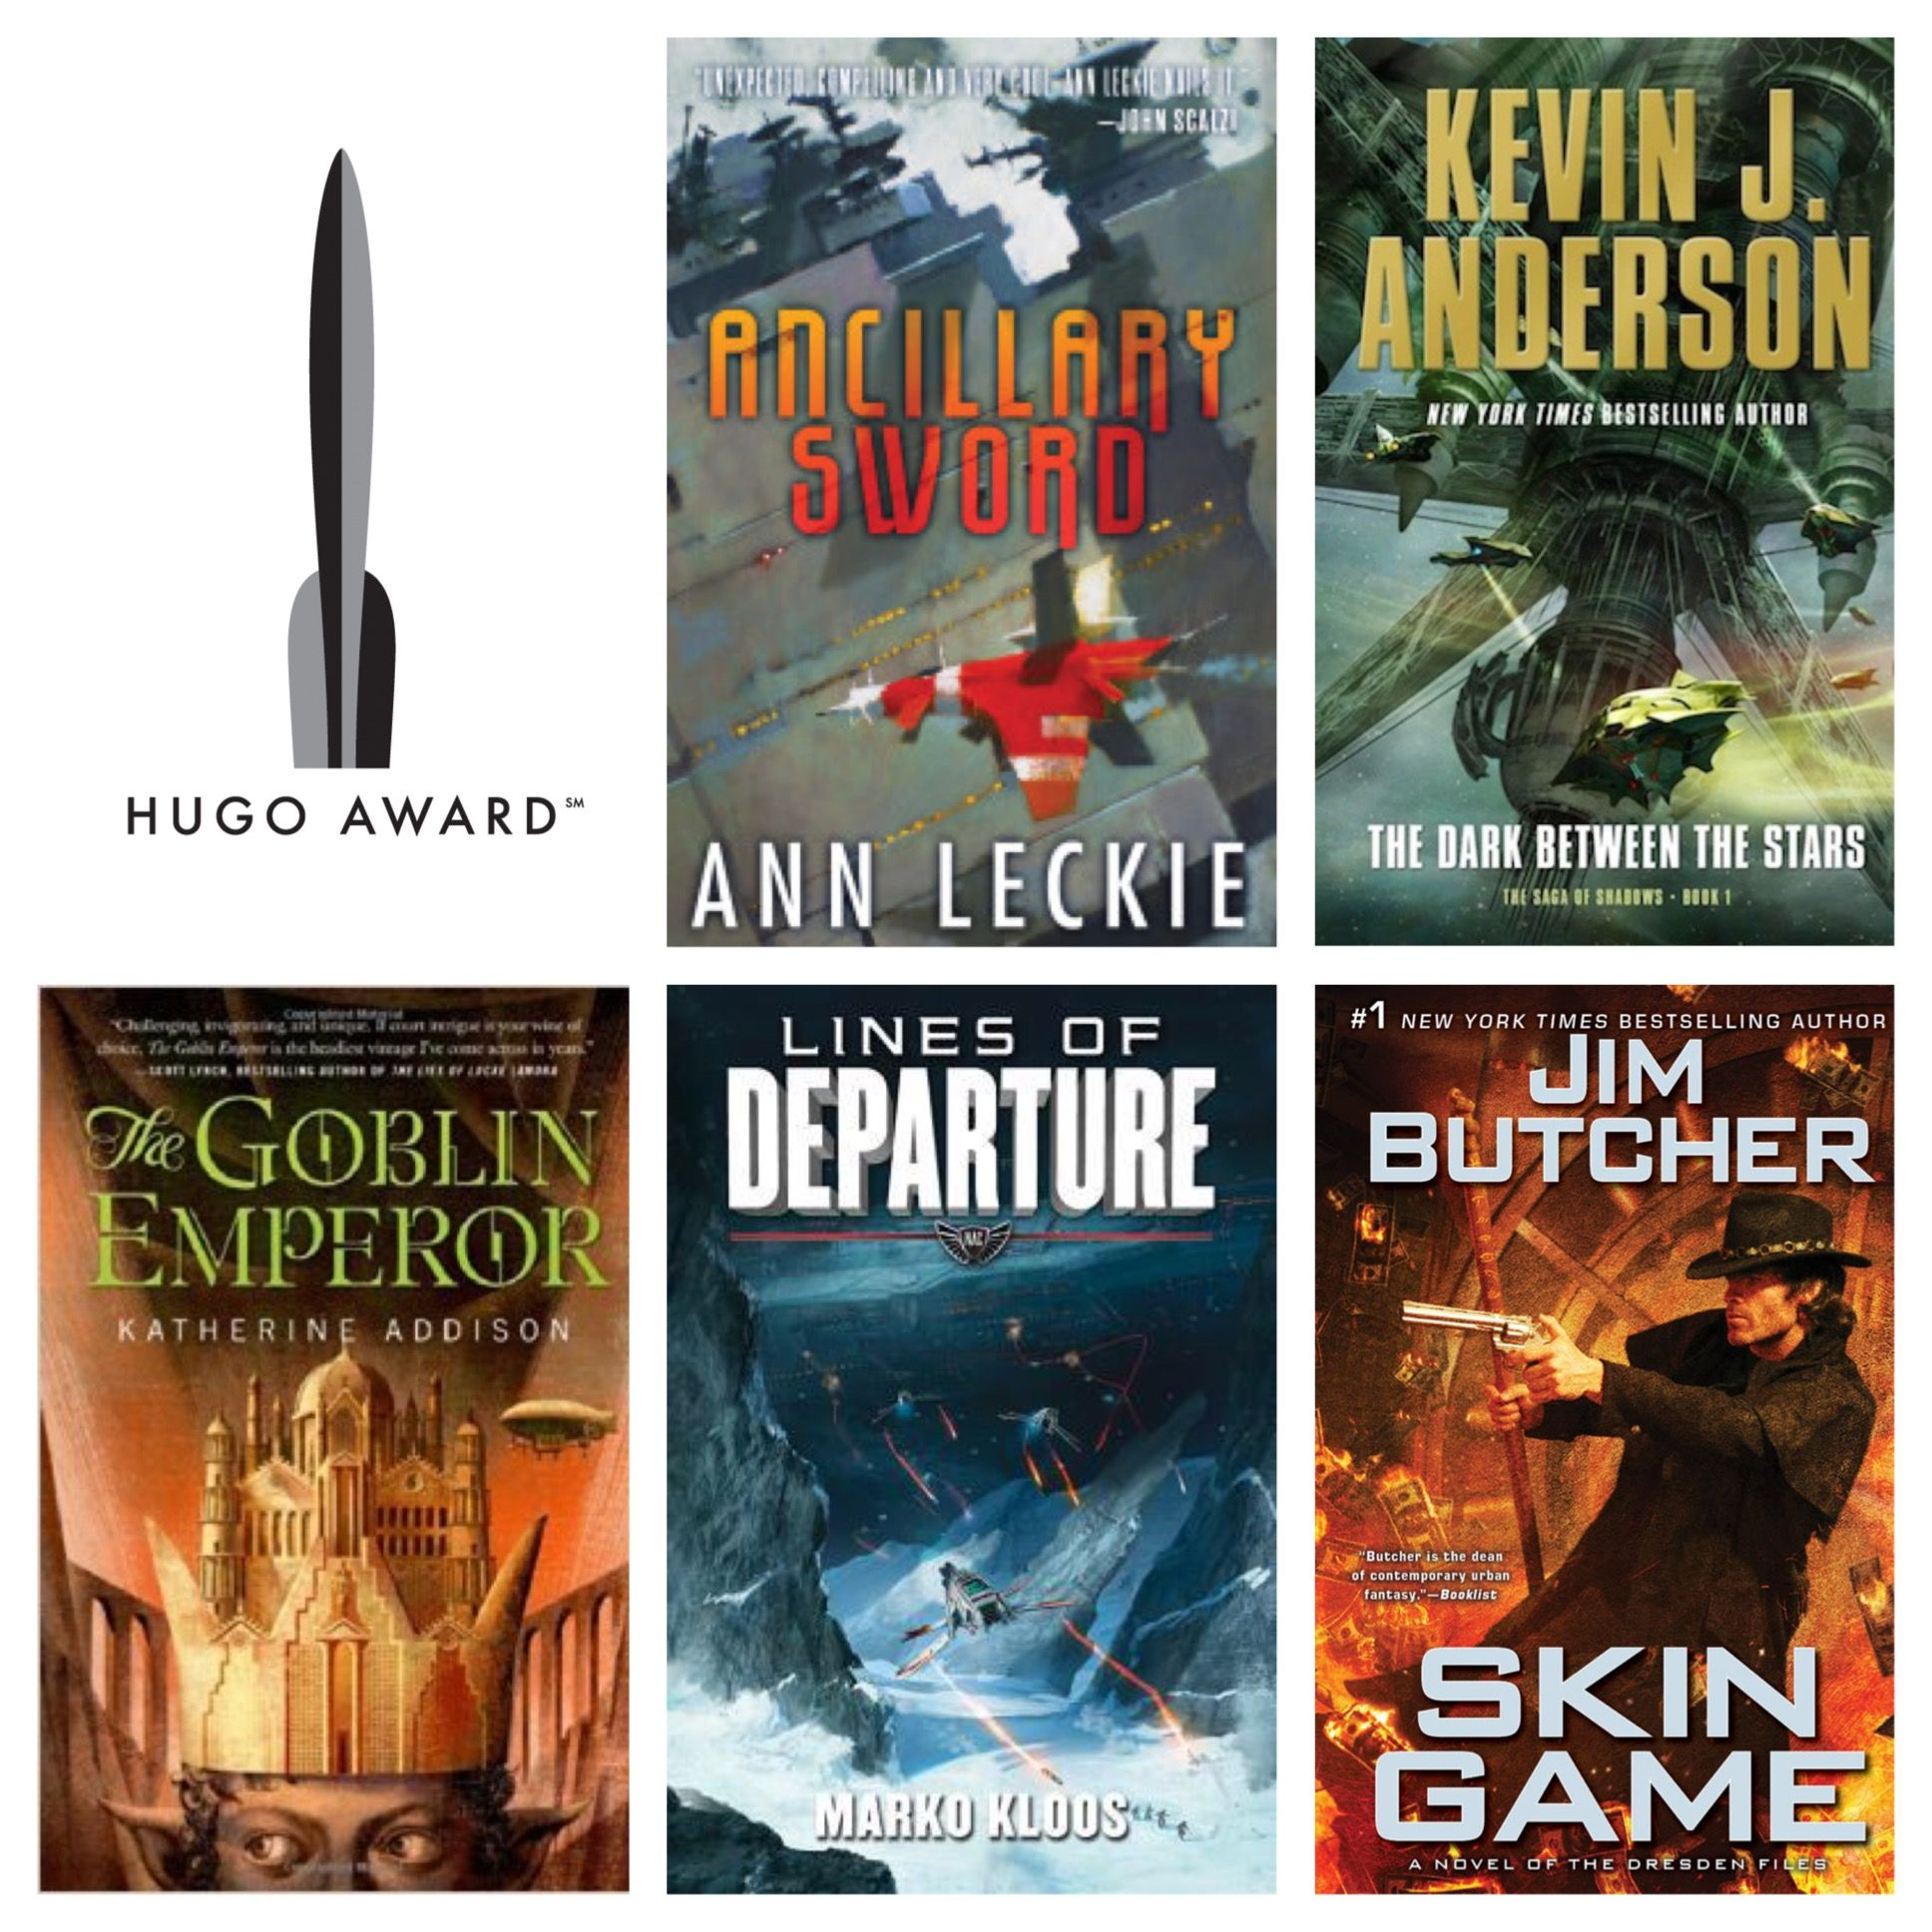 The 2015 Hugo Award nominees (finalists) for Best Novel